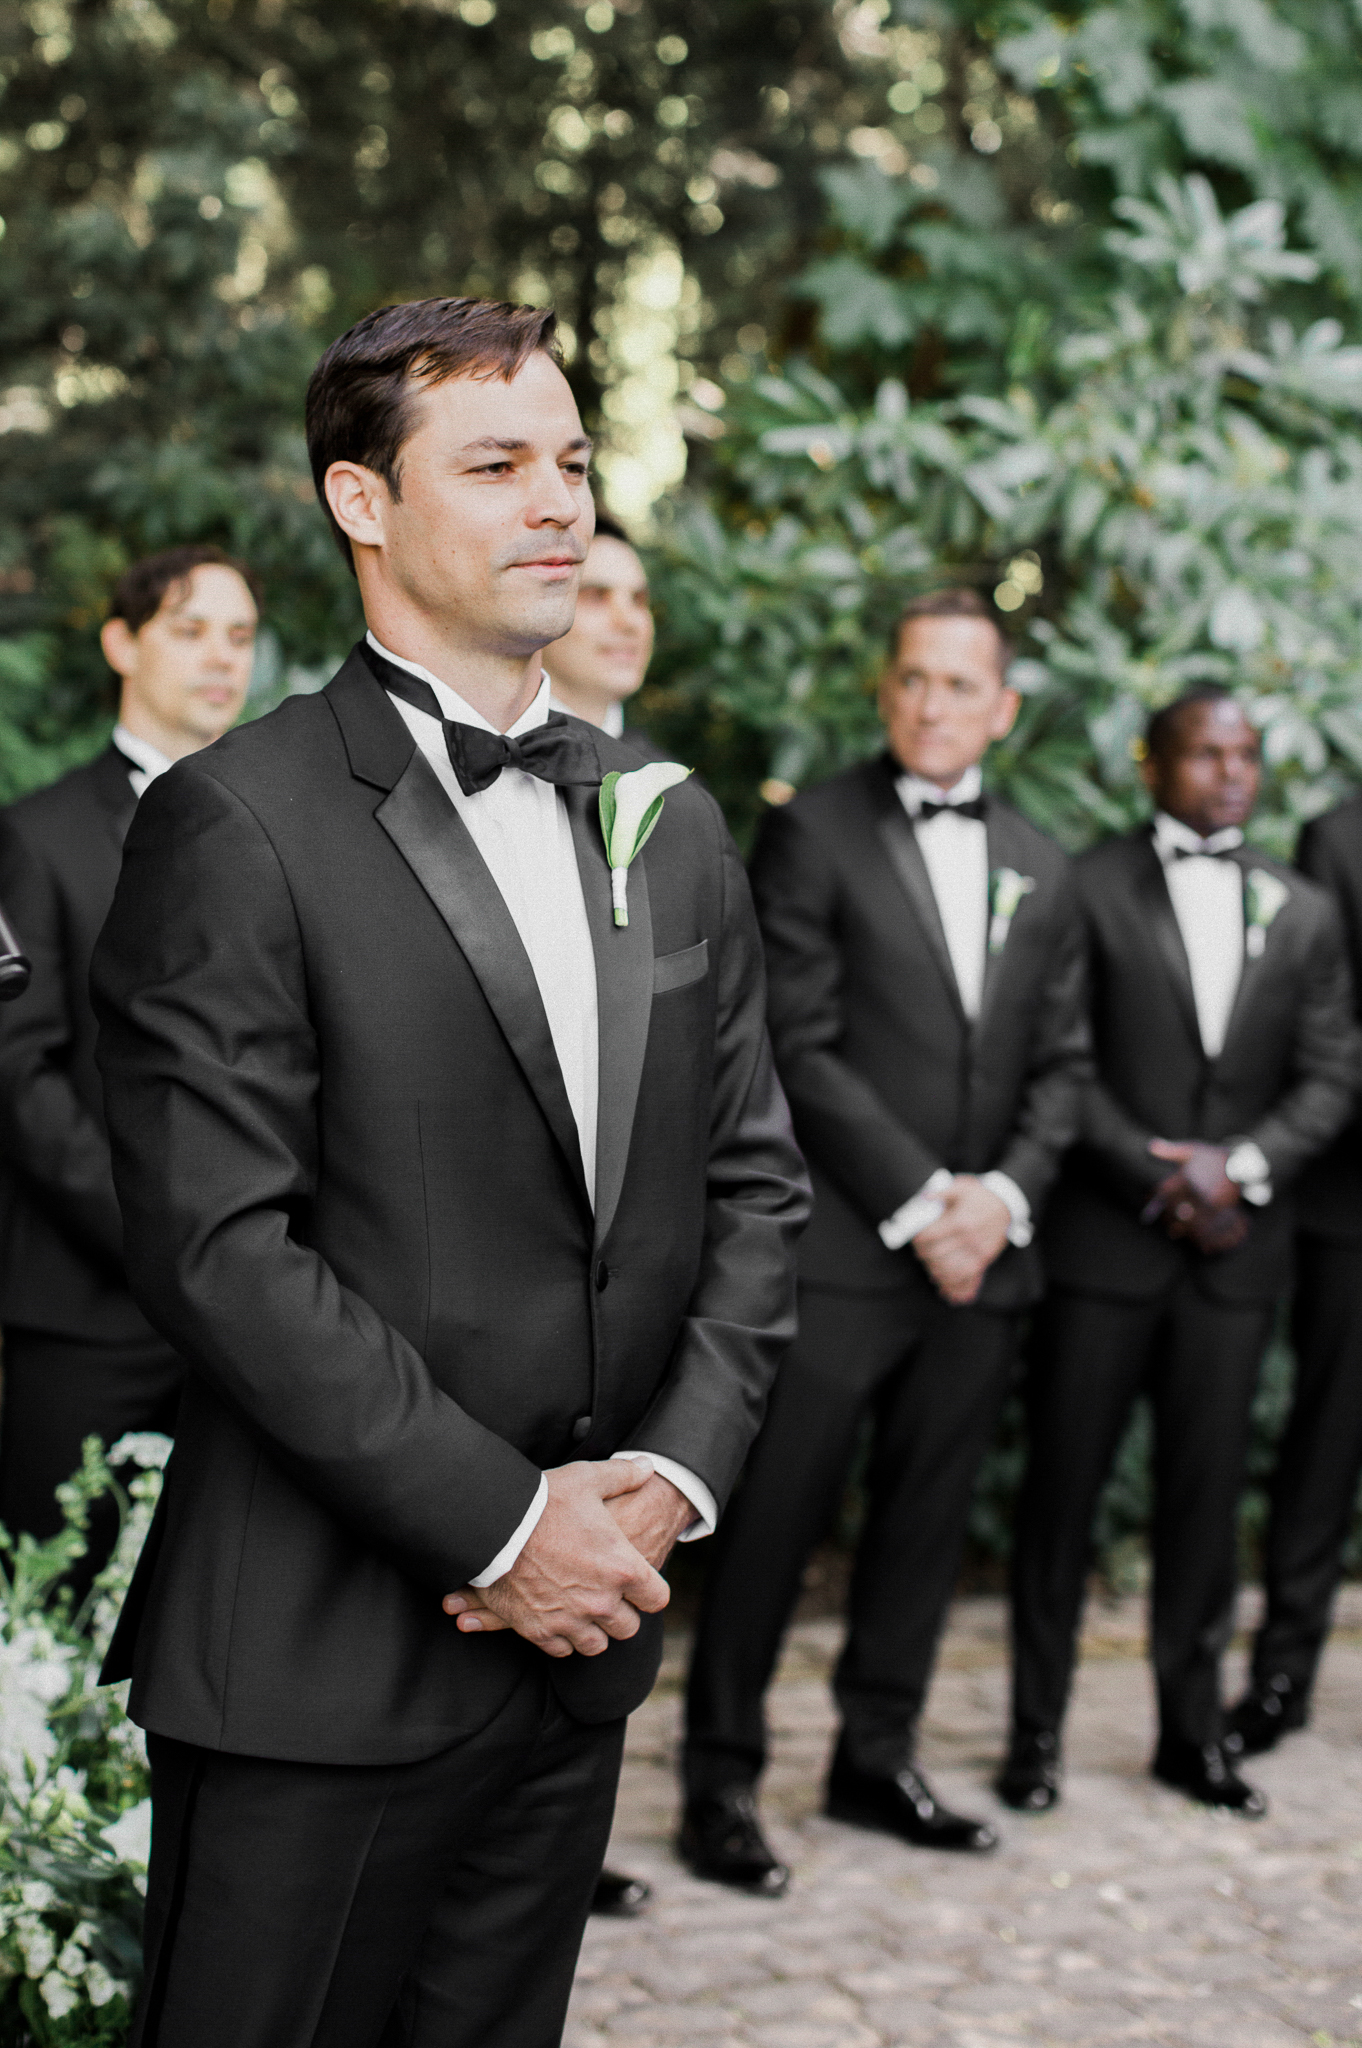 129OutliveCreative_Travel_Photographer_Videographer_Lewis&Clark_Oregon_Elegant_BlackTie_Destination_Wedding.jpg